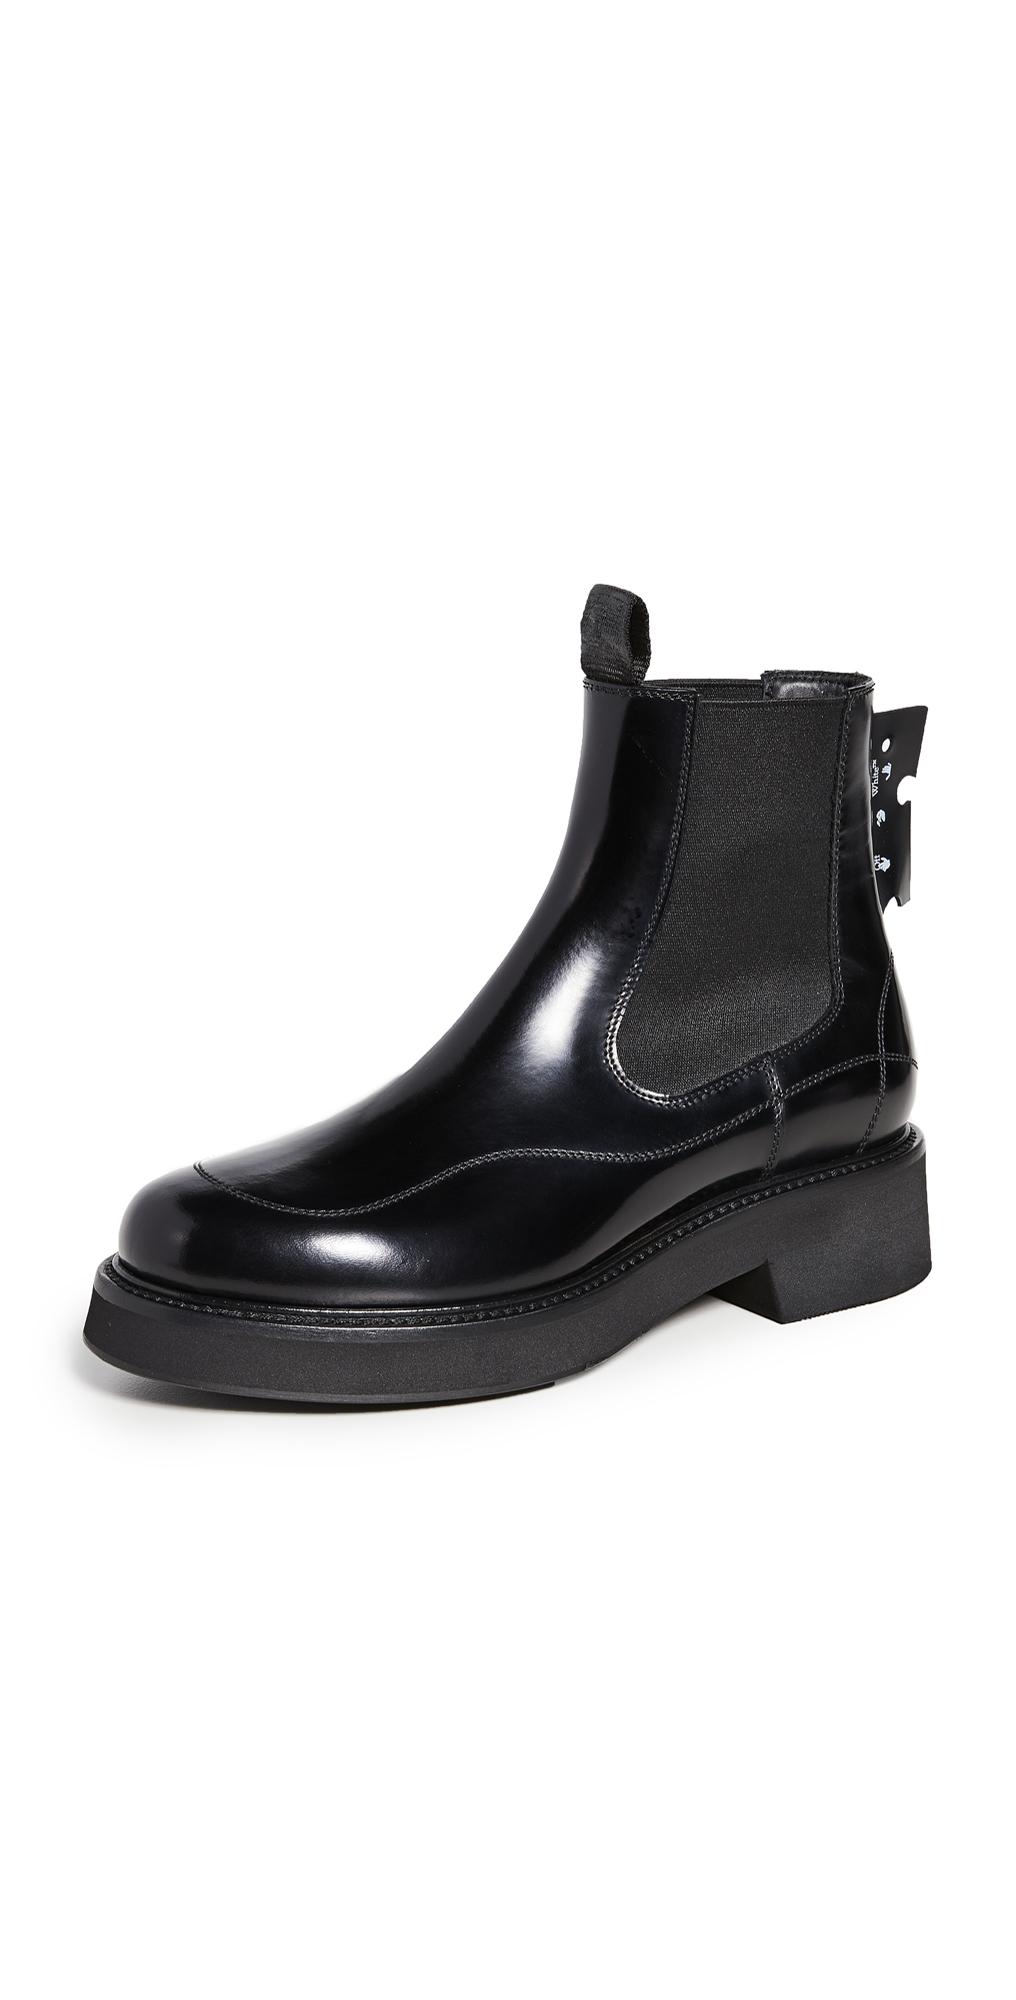 Off-White Chealsea Boots